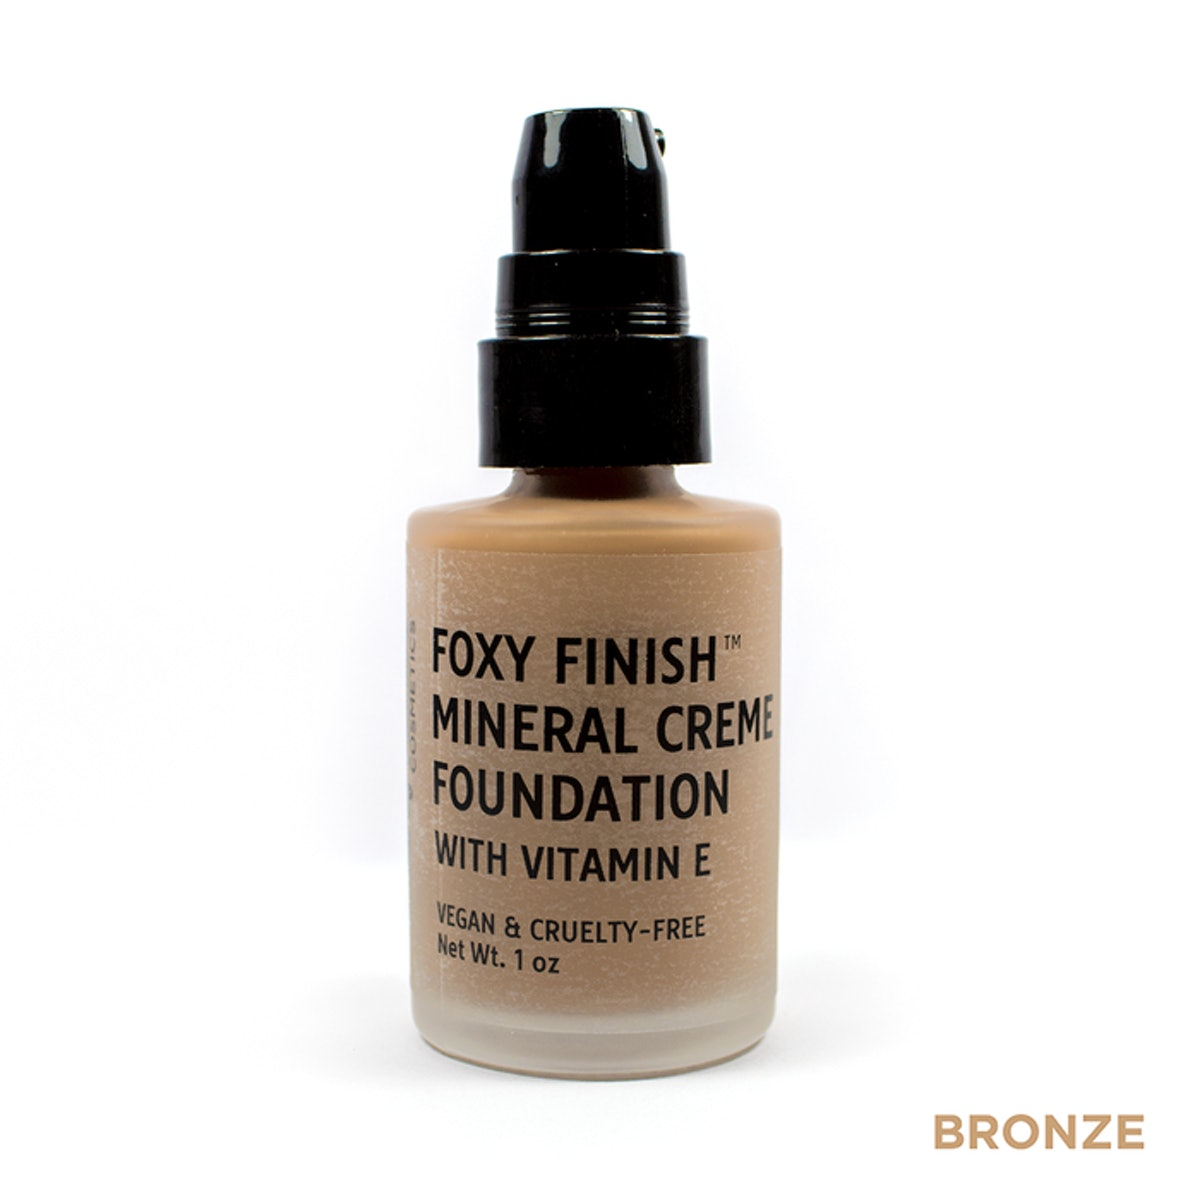 Foxy Finish Mineral Creme Foundation